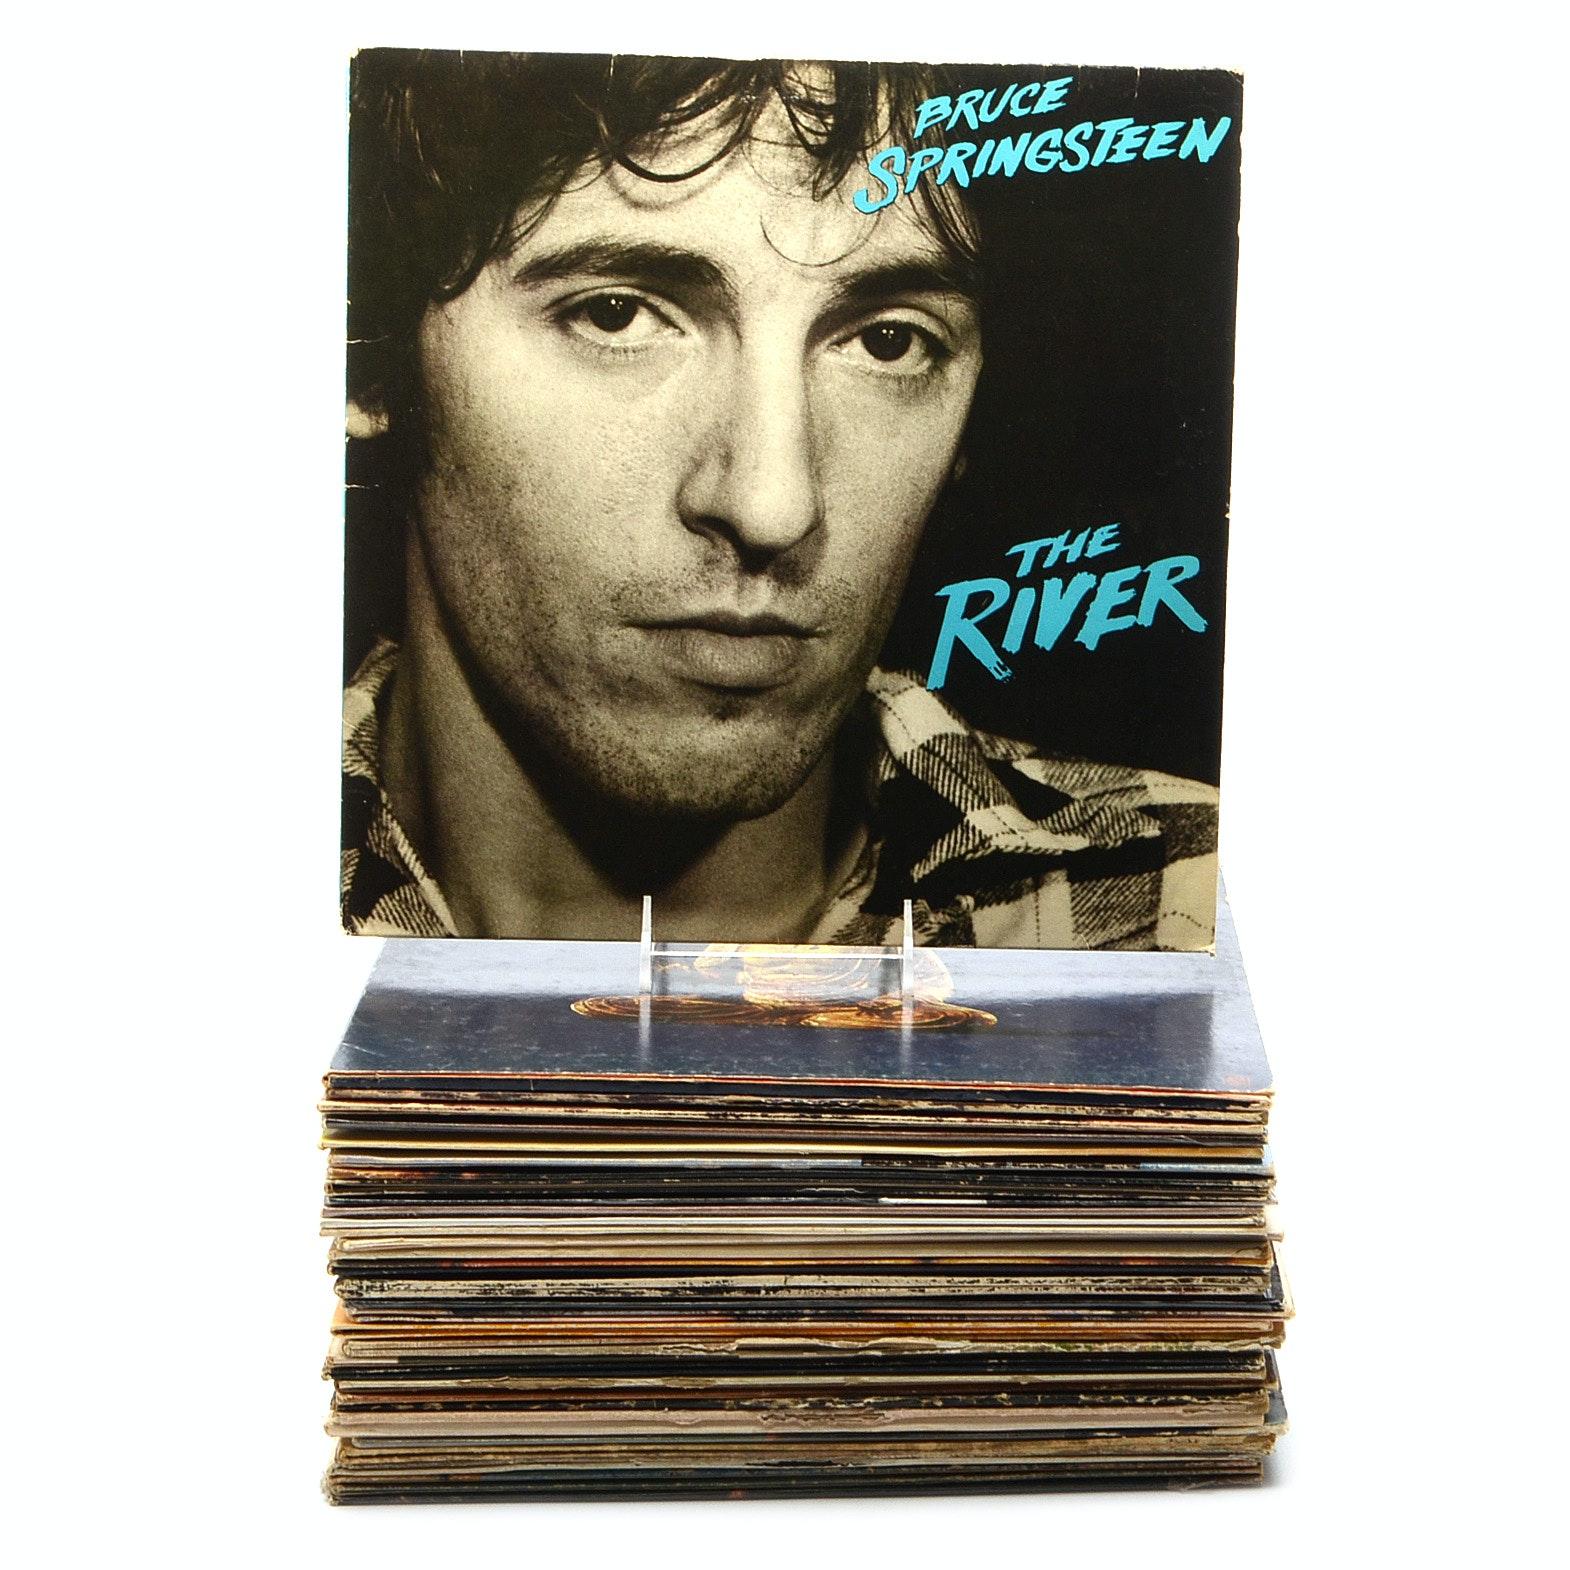 Vintage Vinyl LPs Including Rock, Soft Rock, and More